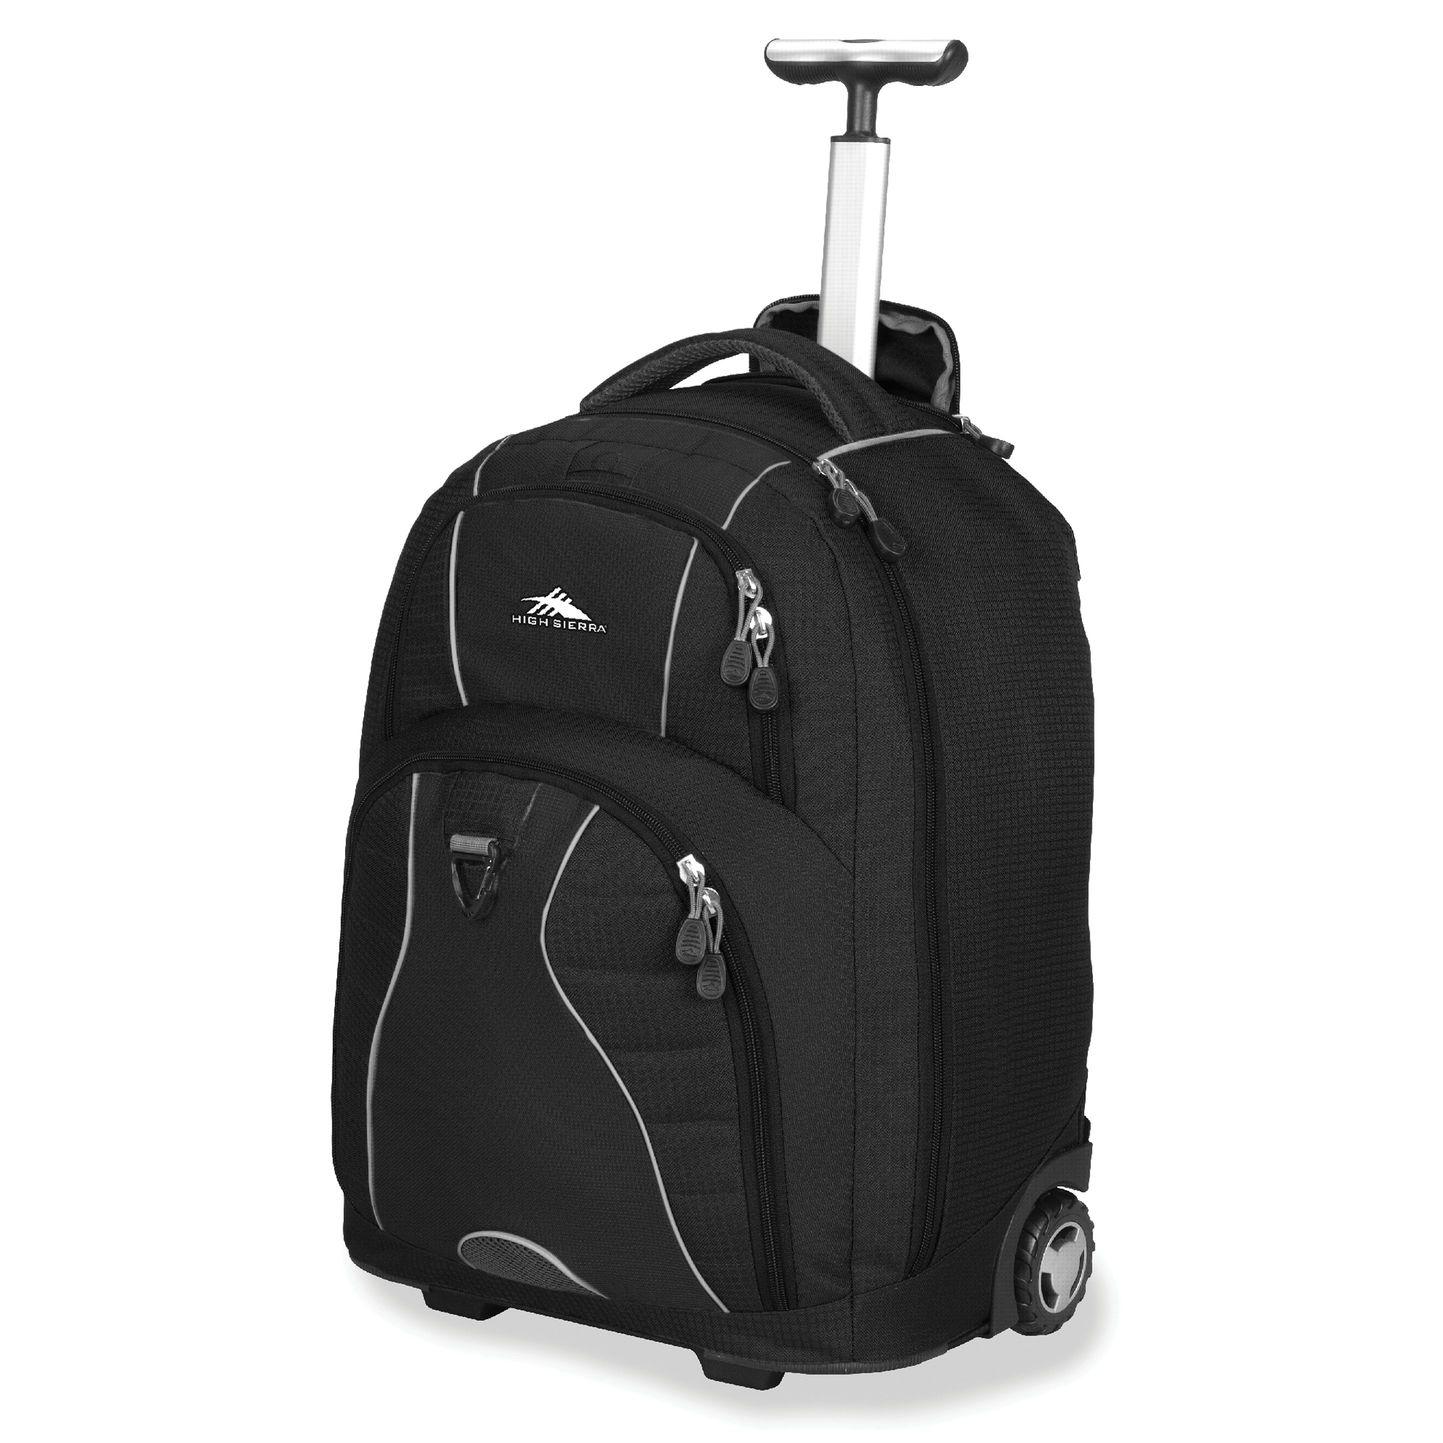 4 Wheel Laptop Backpack